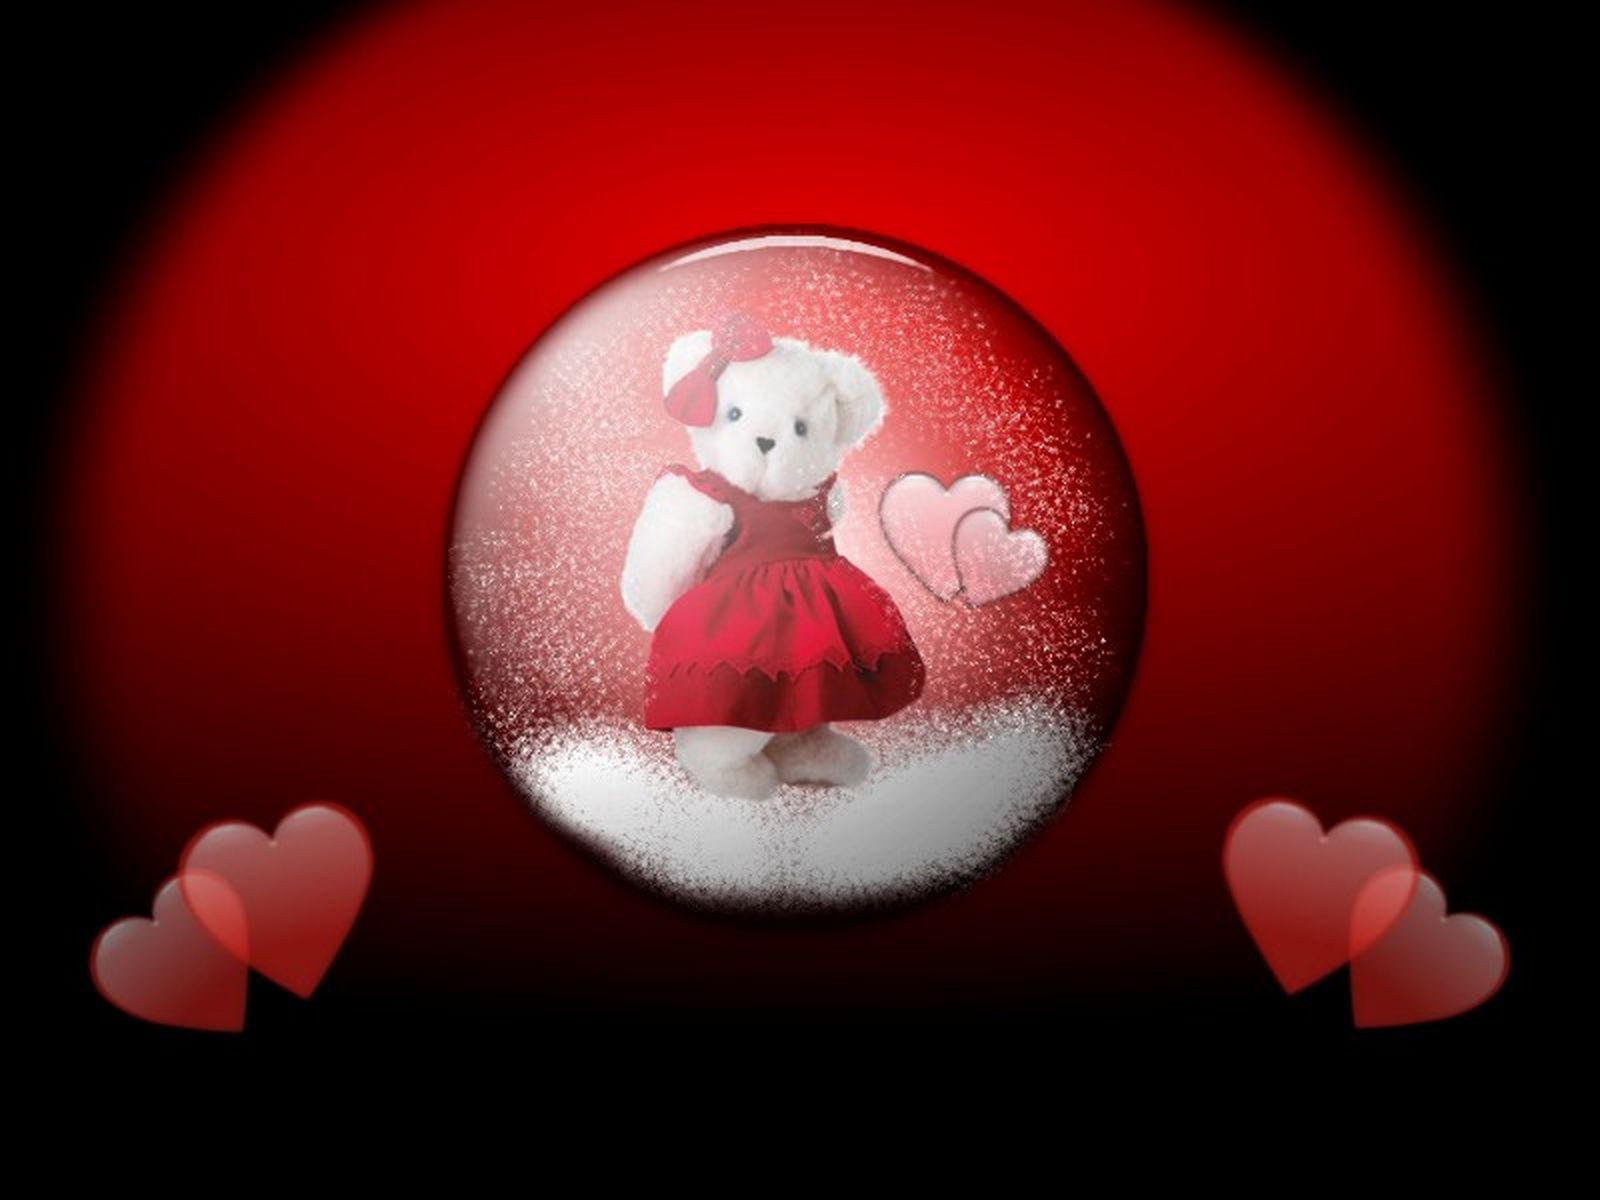 http://2.bp.blogspot.com/-jEj7bWWfjc8/TlFIFrctbqI/AAAAAAAABD8/6-aORgfZVCE/s1600/Romantic_Love_Wallpapers_Umeaurhum39.jpg